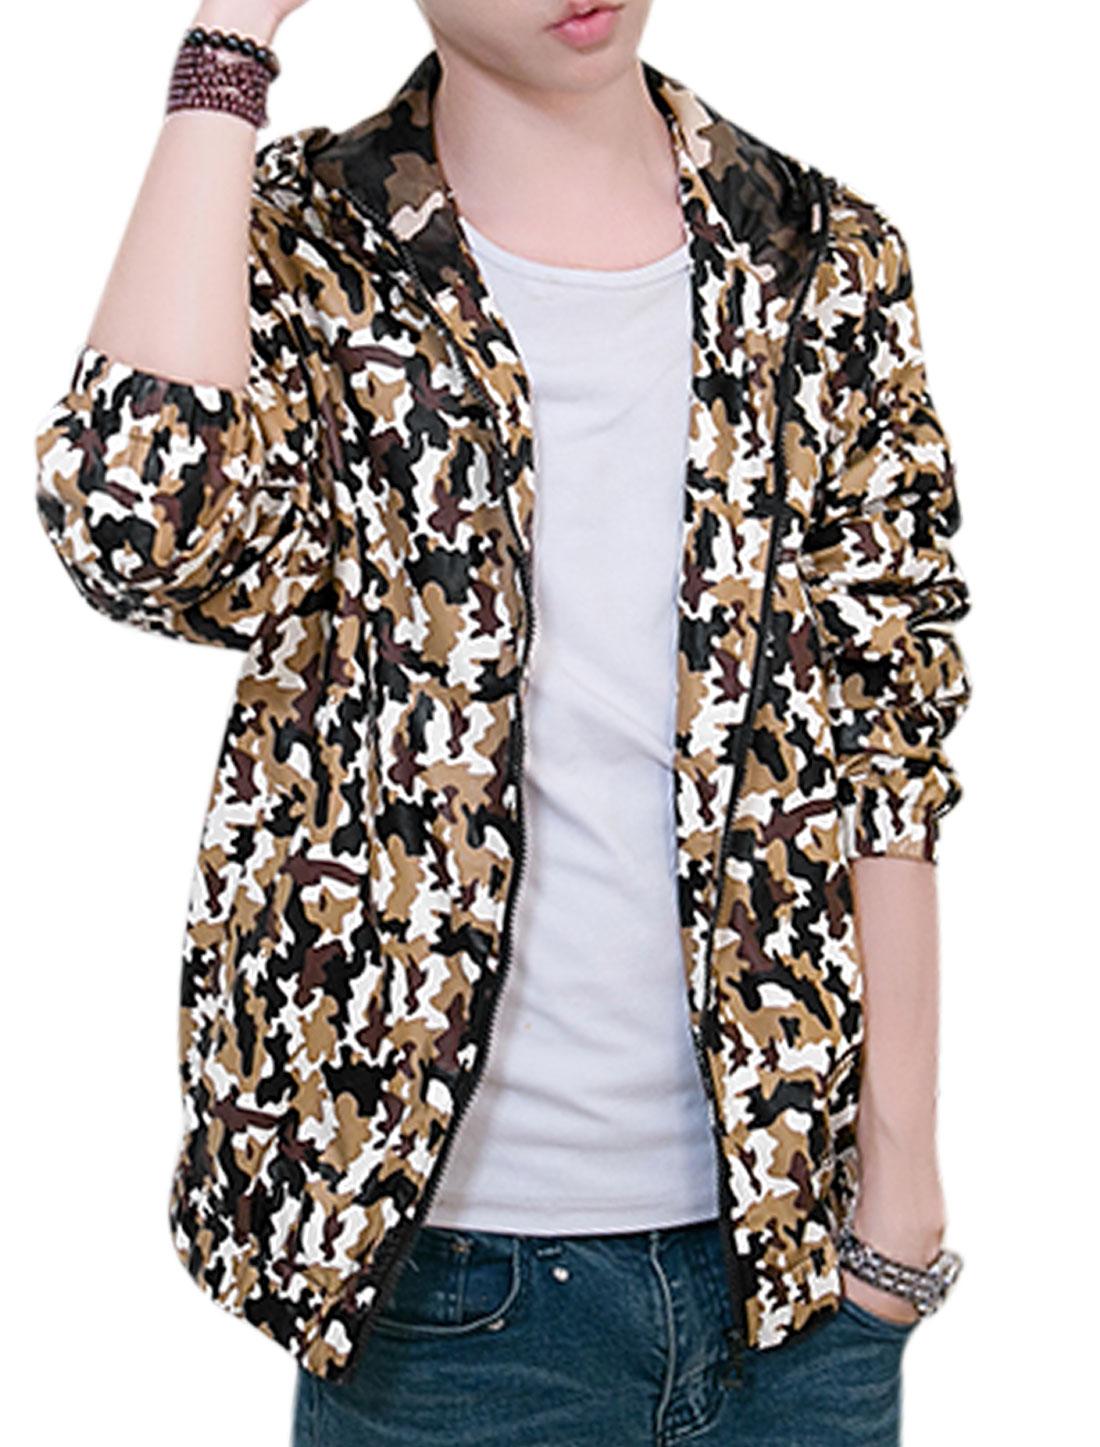 Men Long Sleeves Zip Closure Camouflage Pattern Hooded Jacket Khaki White M